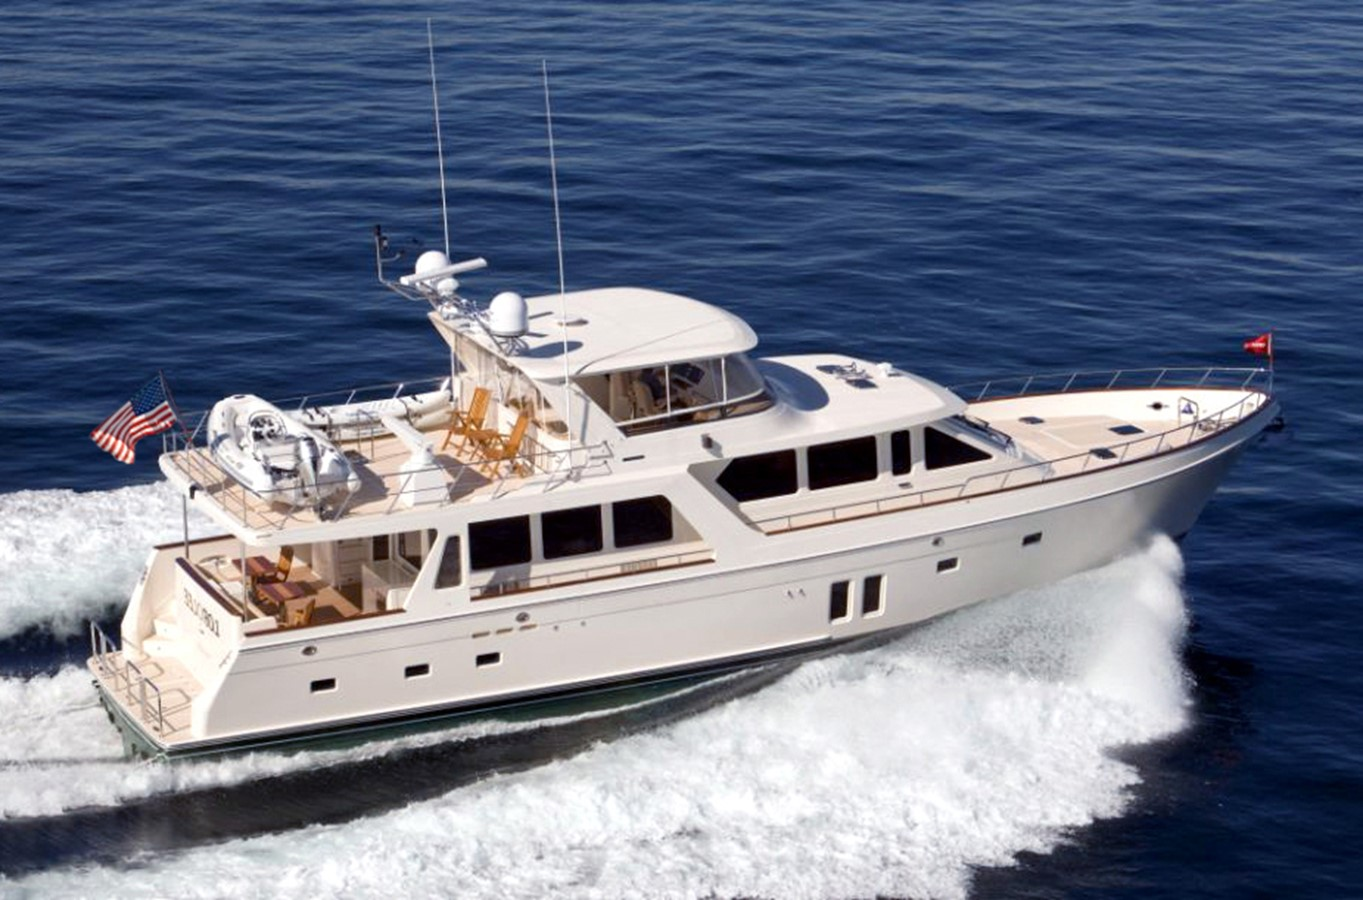 2020 OFFSHORE YACHTS 76/80 Motoryacht Motor Yacht 2571167